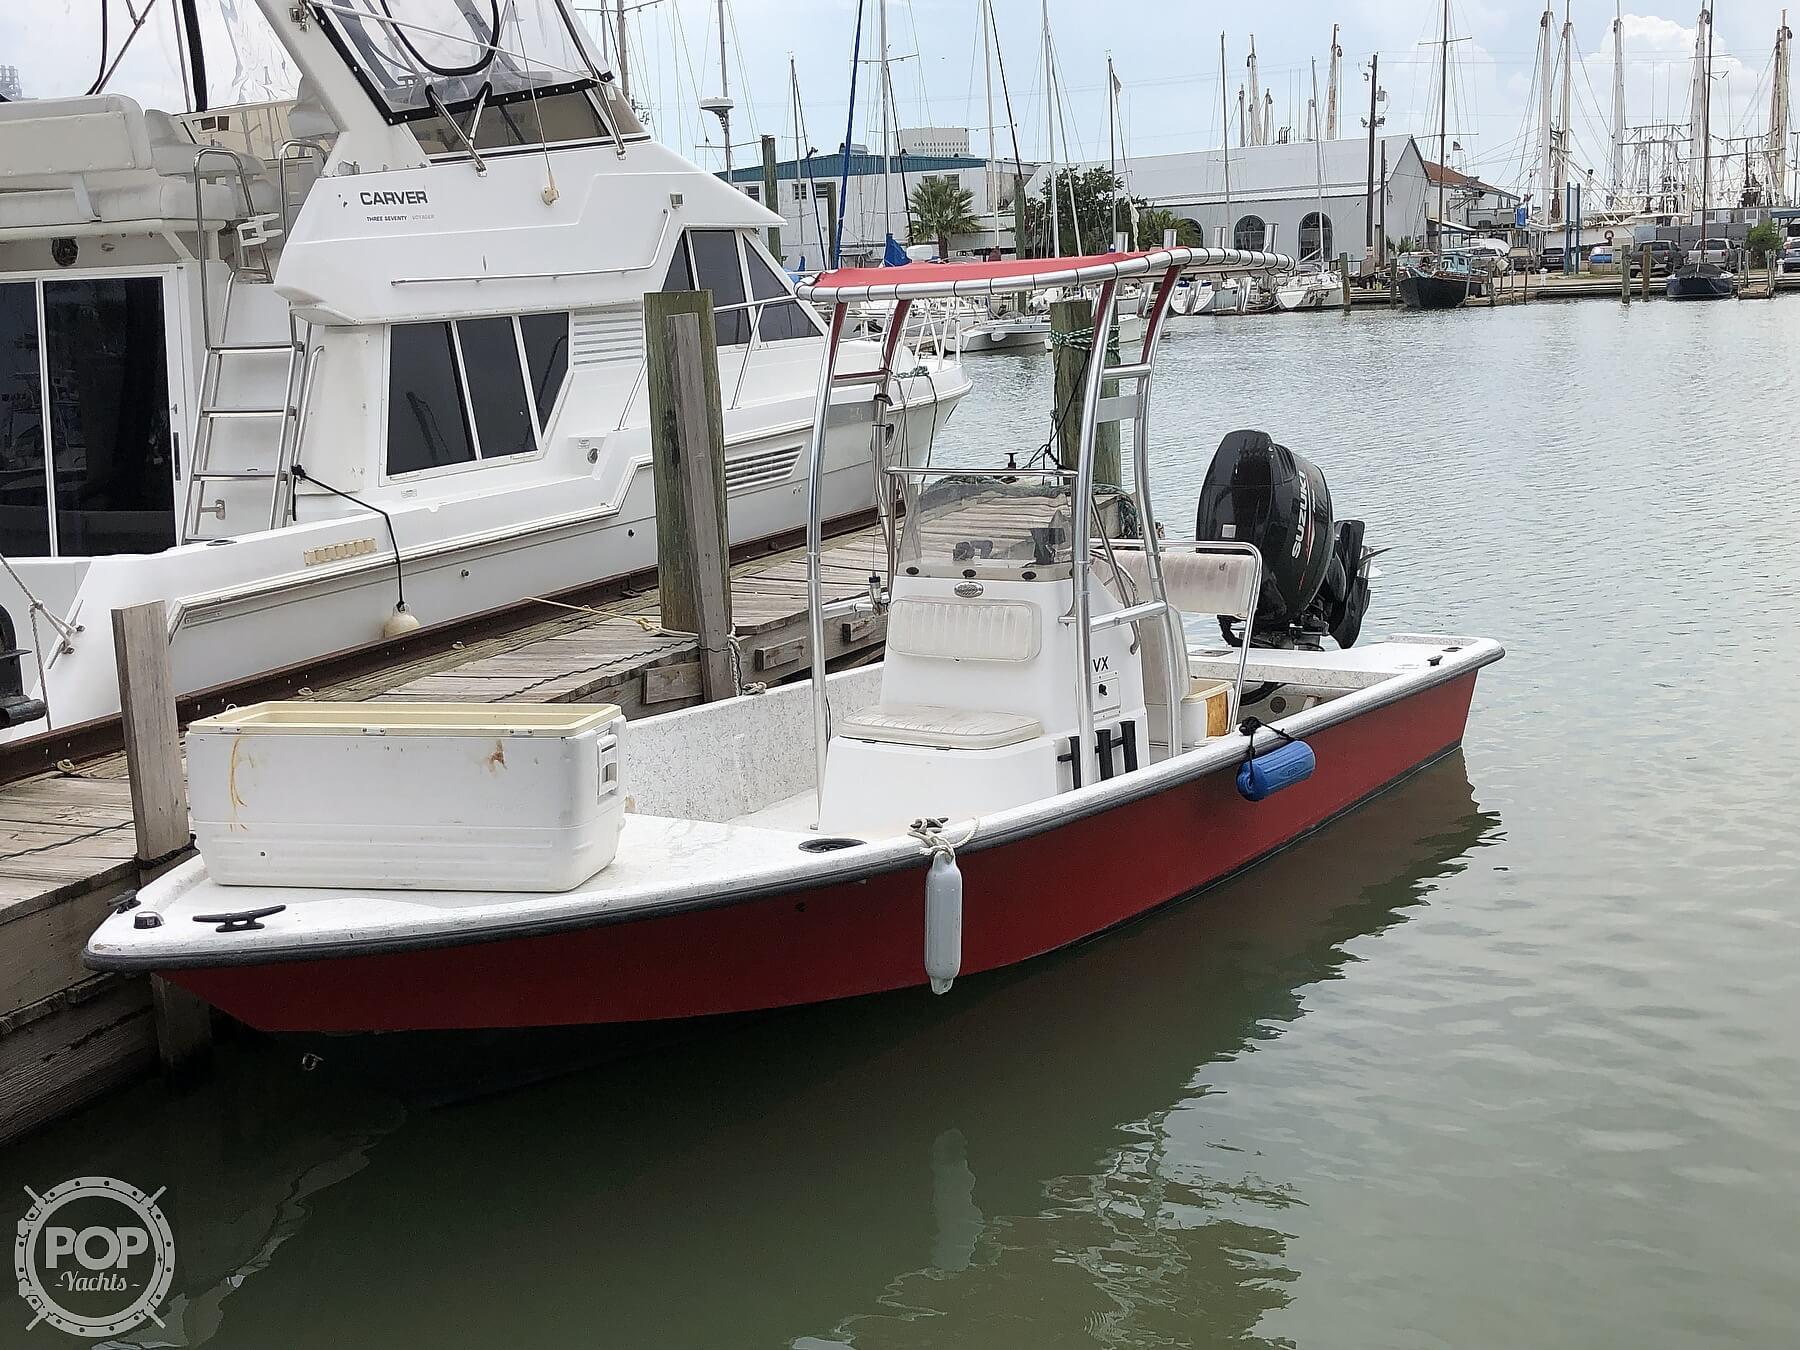 Sold Kenner 21vx Boat In Galveston Tx 149562